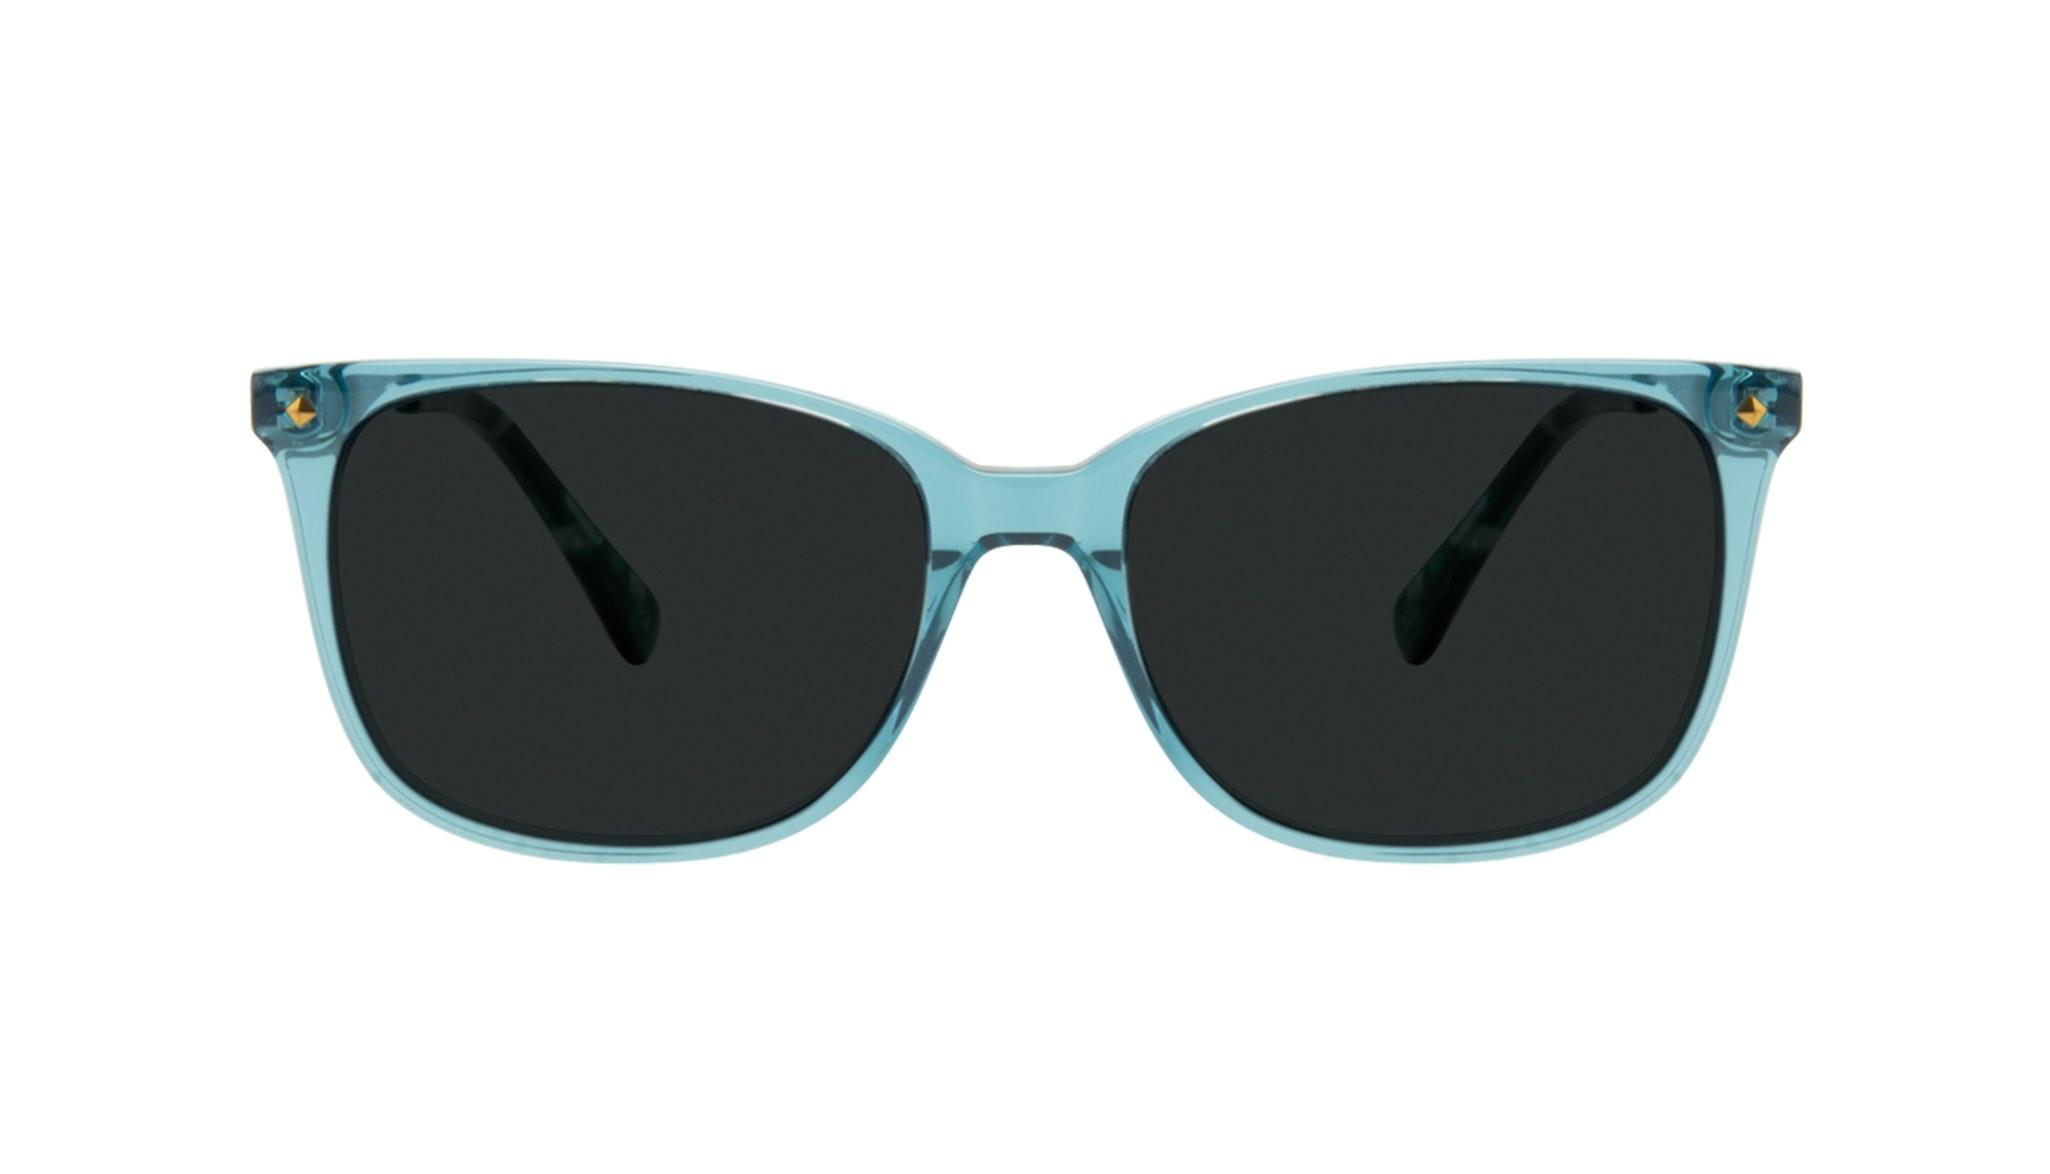 Affordable Fashion Glasses Rectangle Square Sunglasses Women Refine Teal